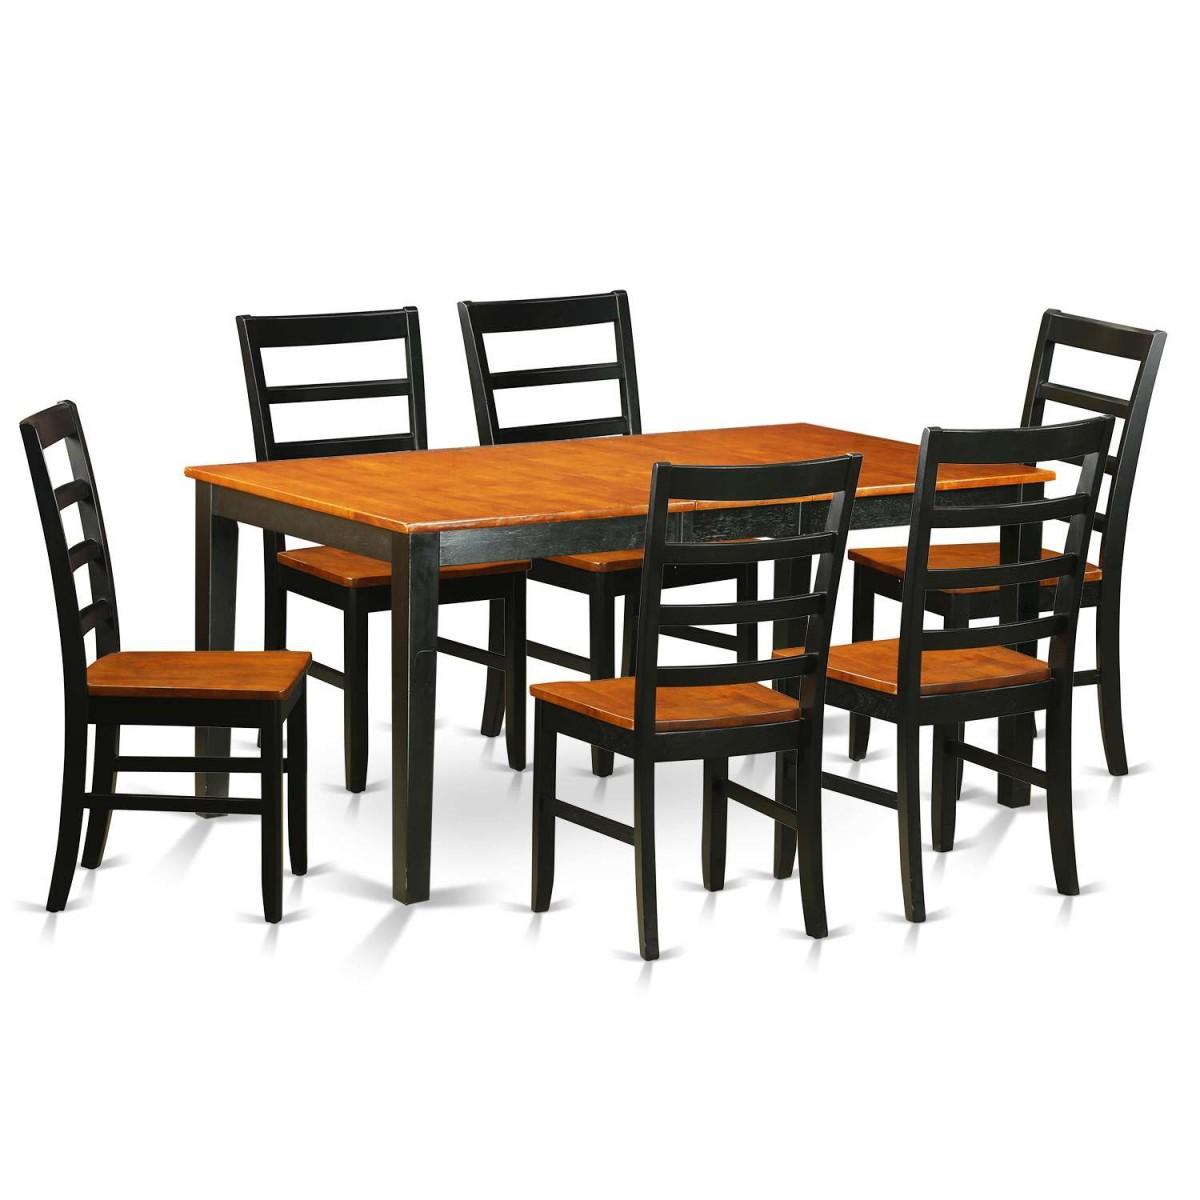 East West Nicoli 6 Piece Dining Set: East West Furniture Nicoli 7 Piece Dining Table Set